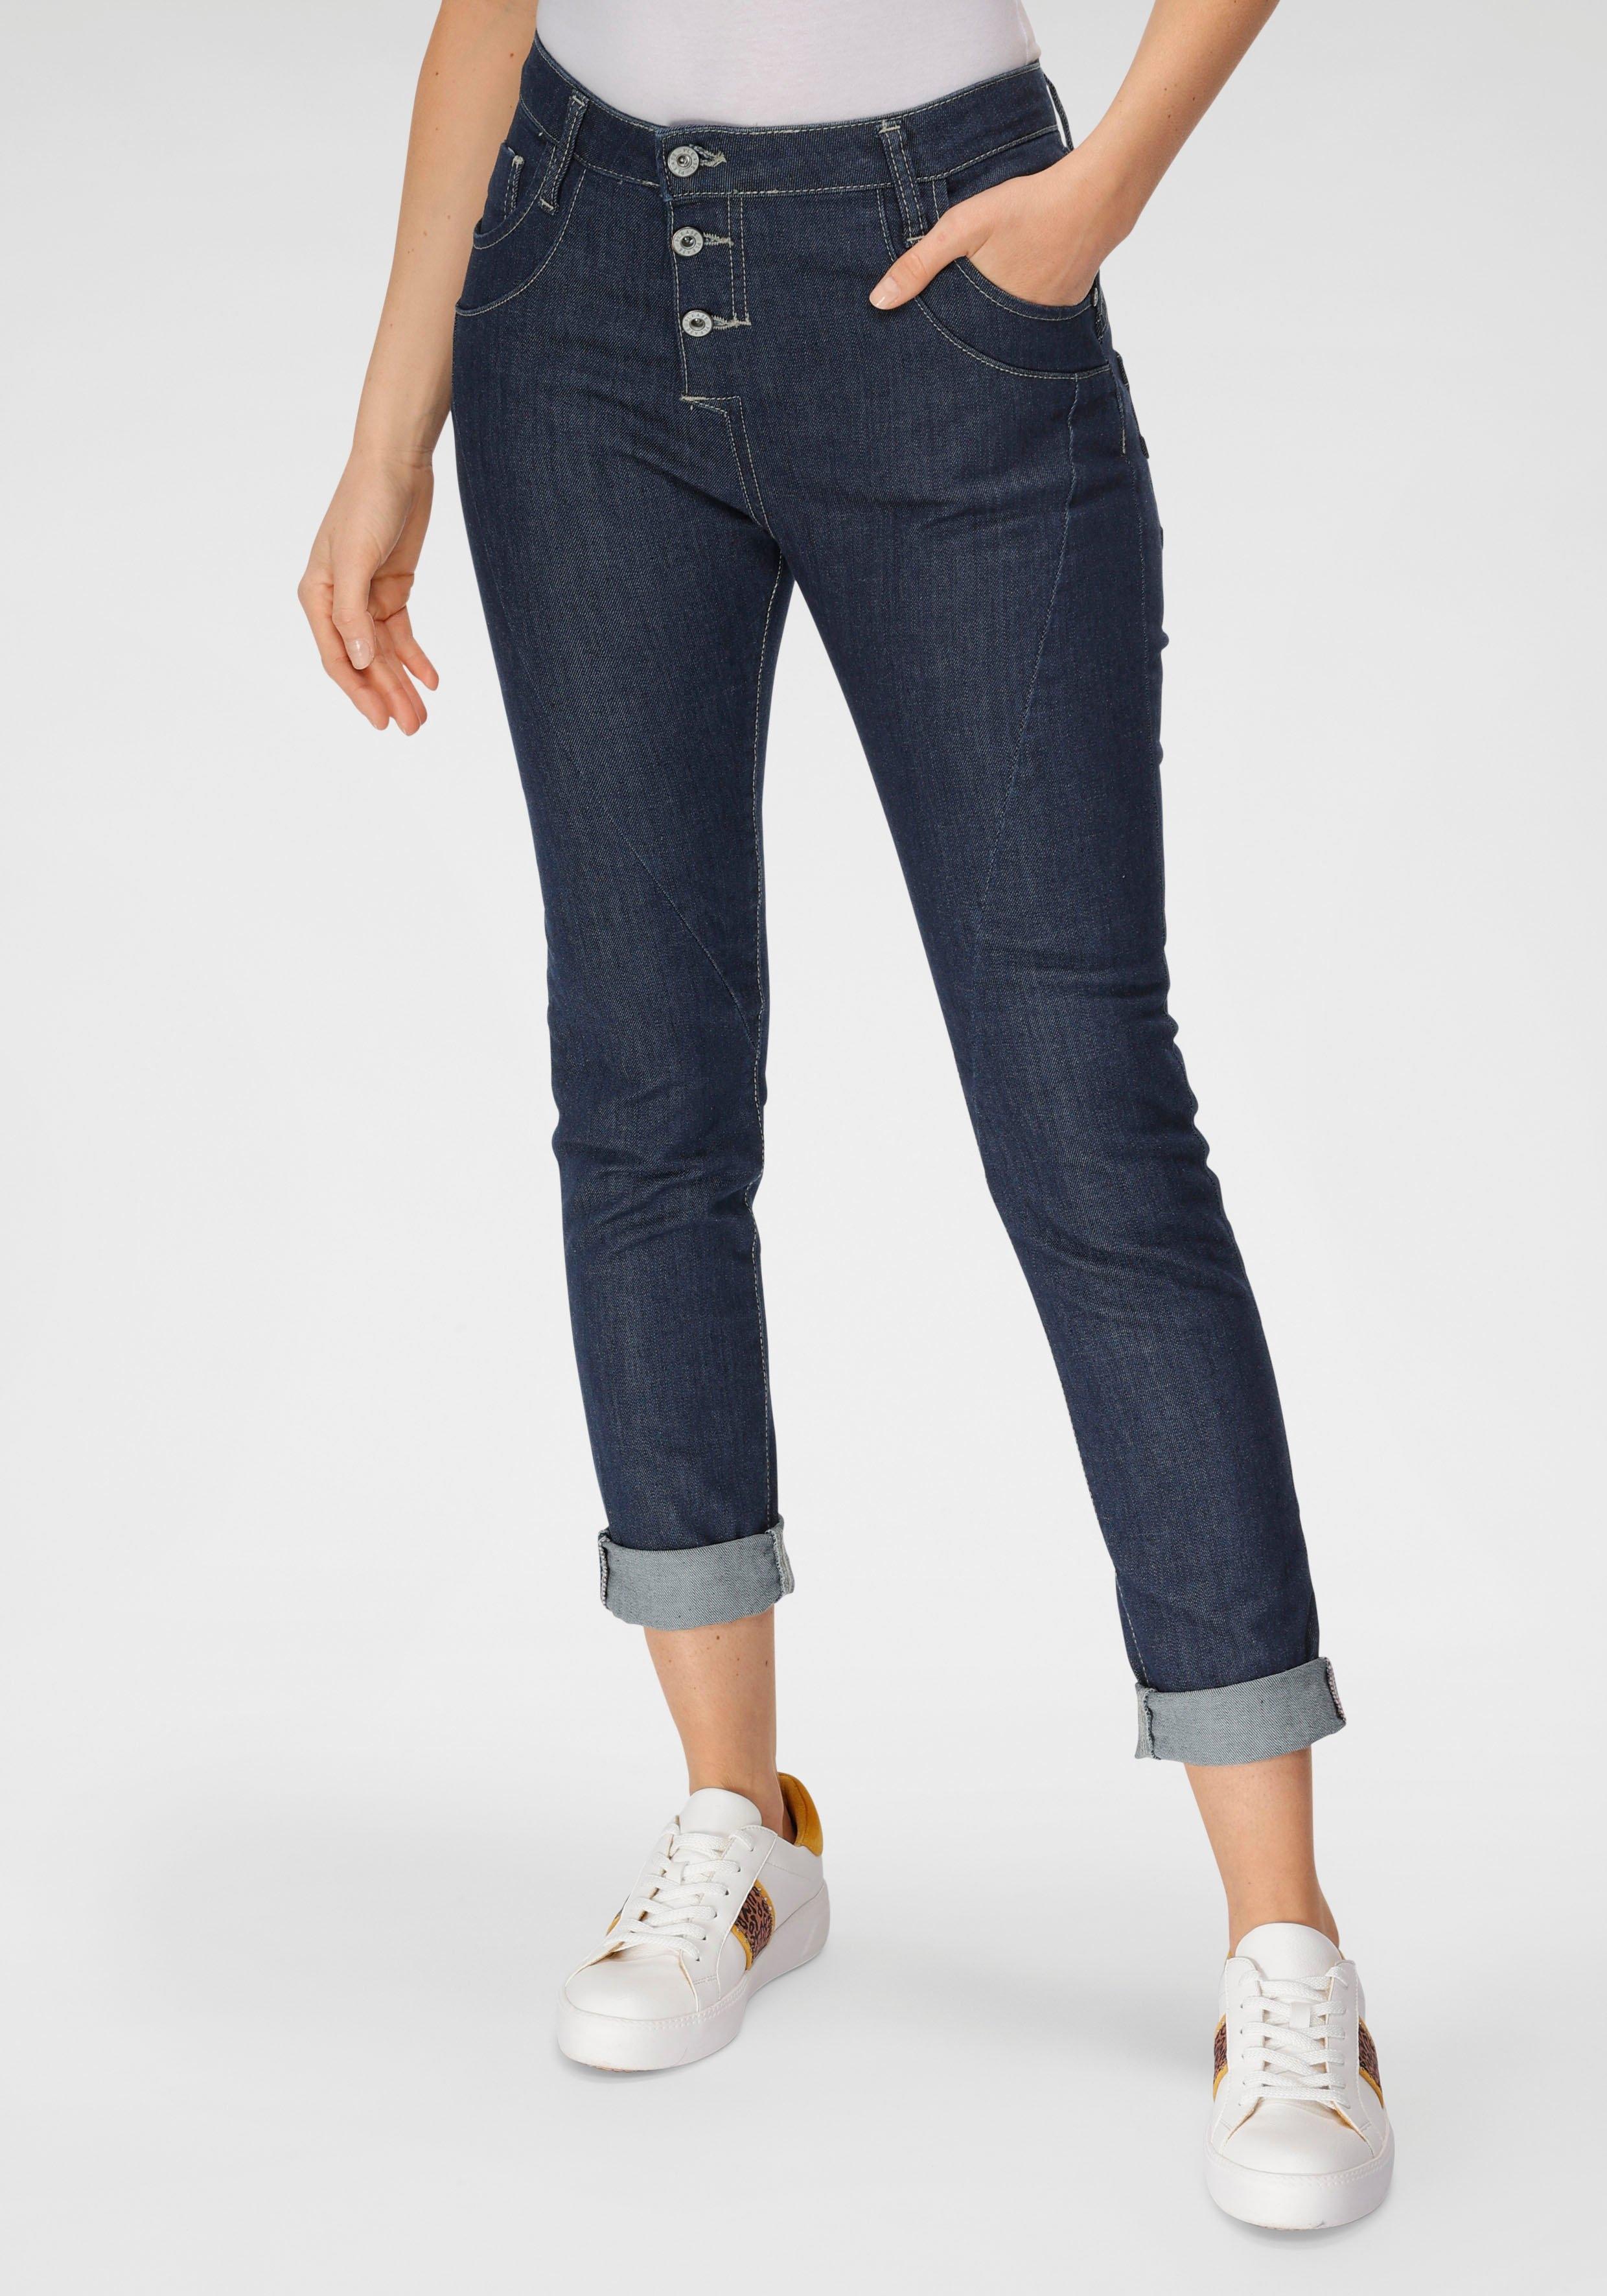 Please Jeans boyfriendjeans P 78A Original boyfriend-cut voordelig en veilig online kopen